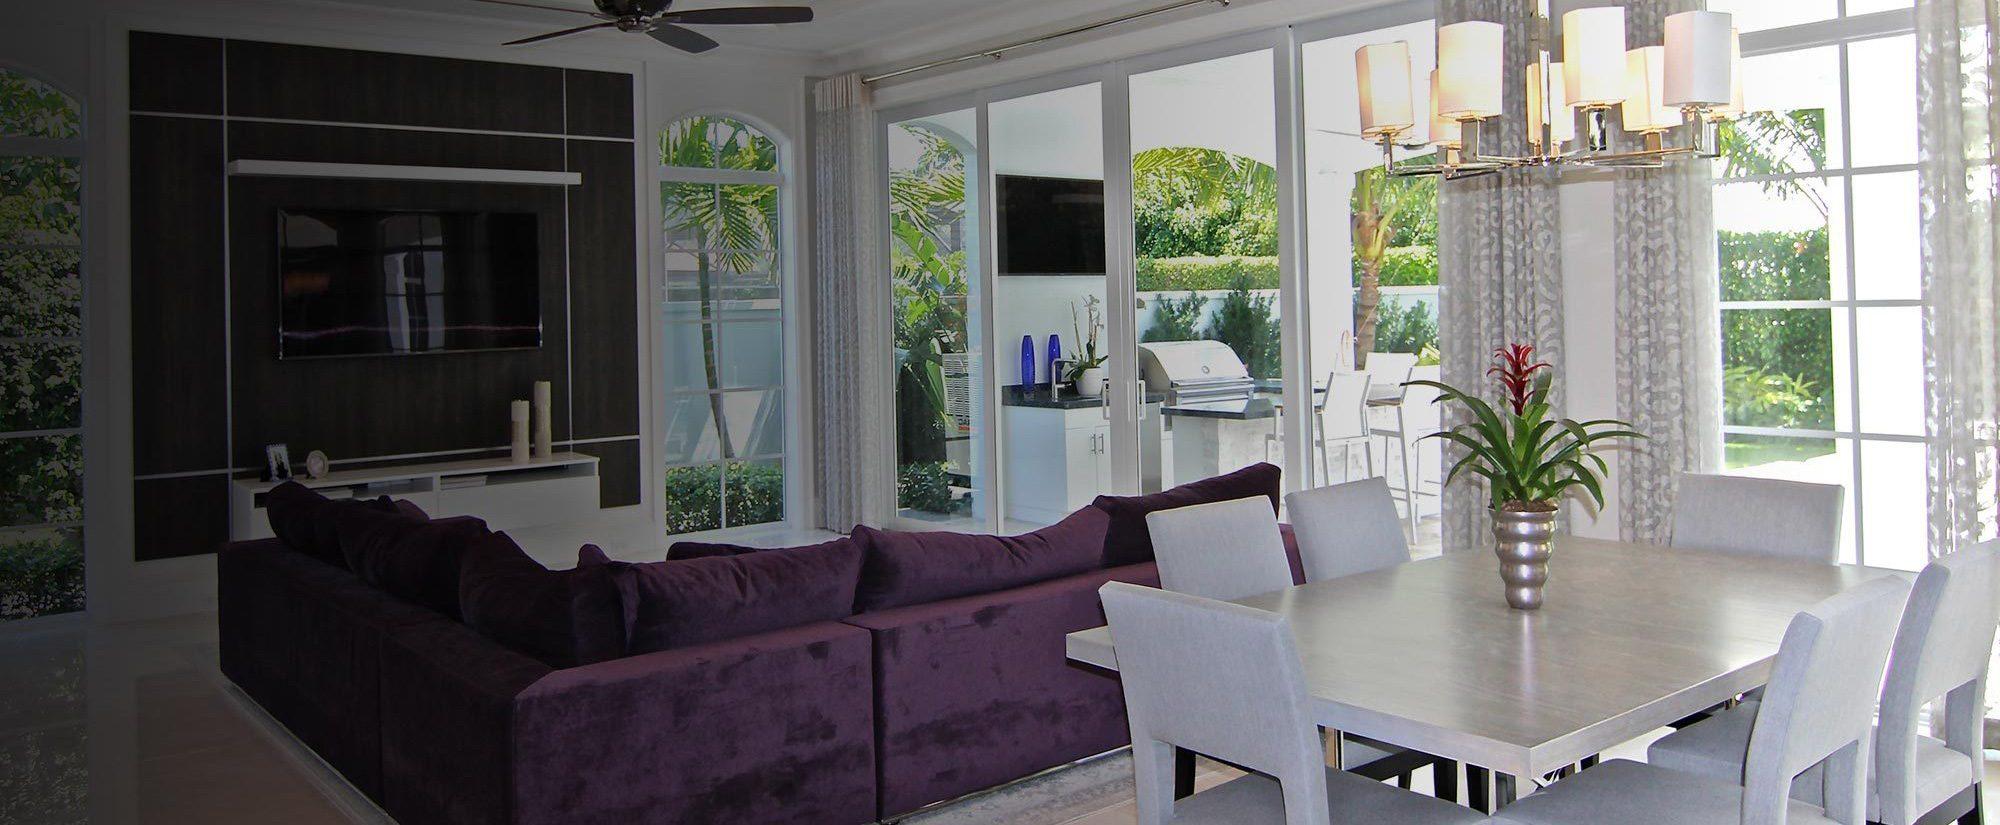 the bahamas floridas premier interior design firm interior design